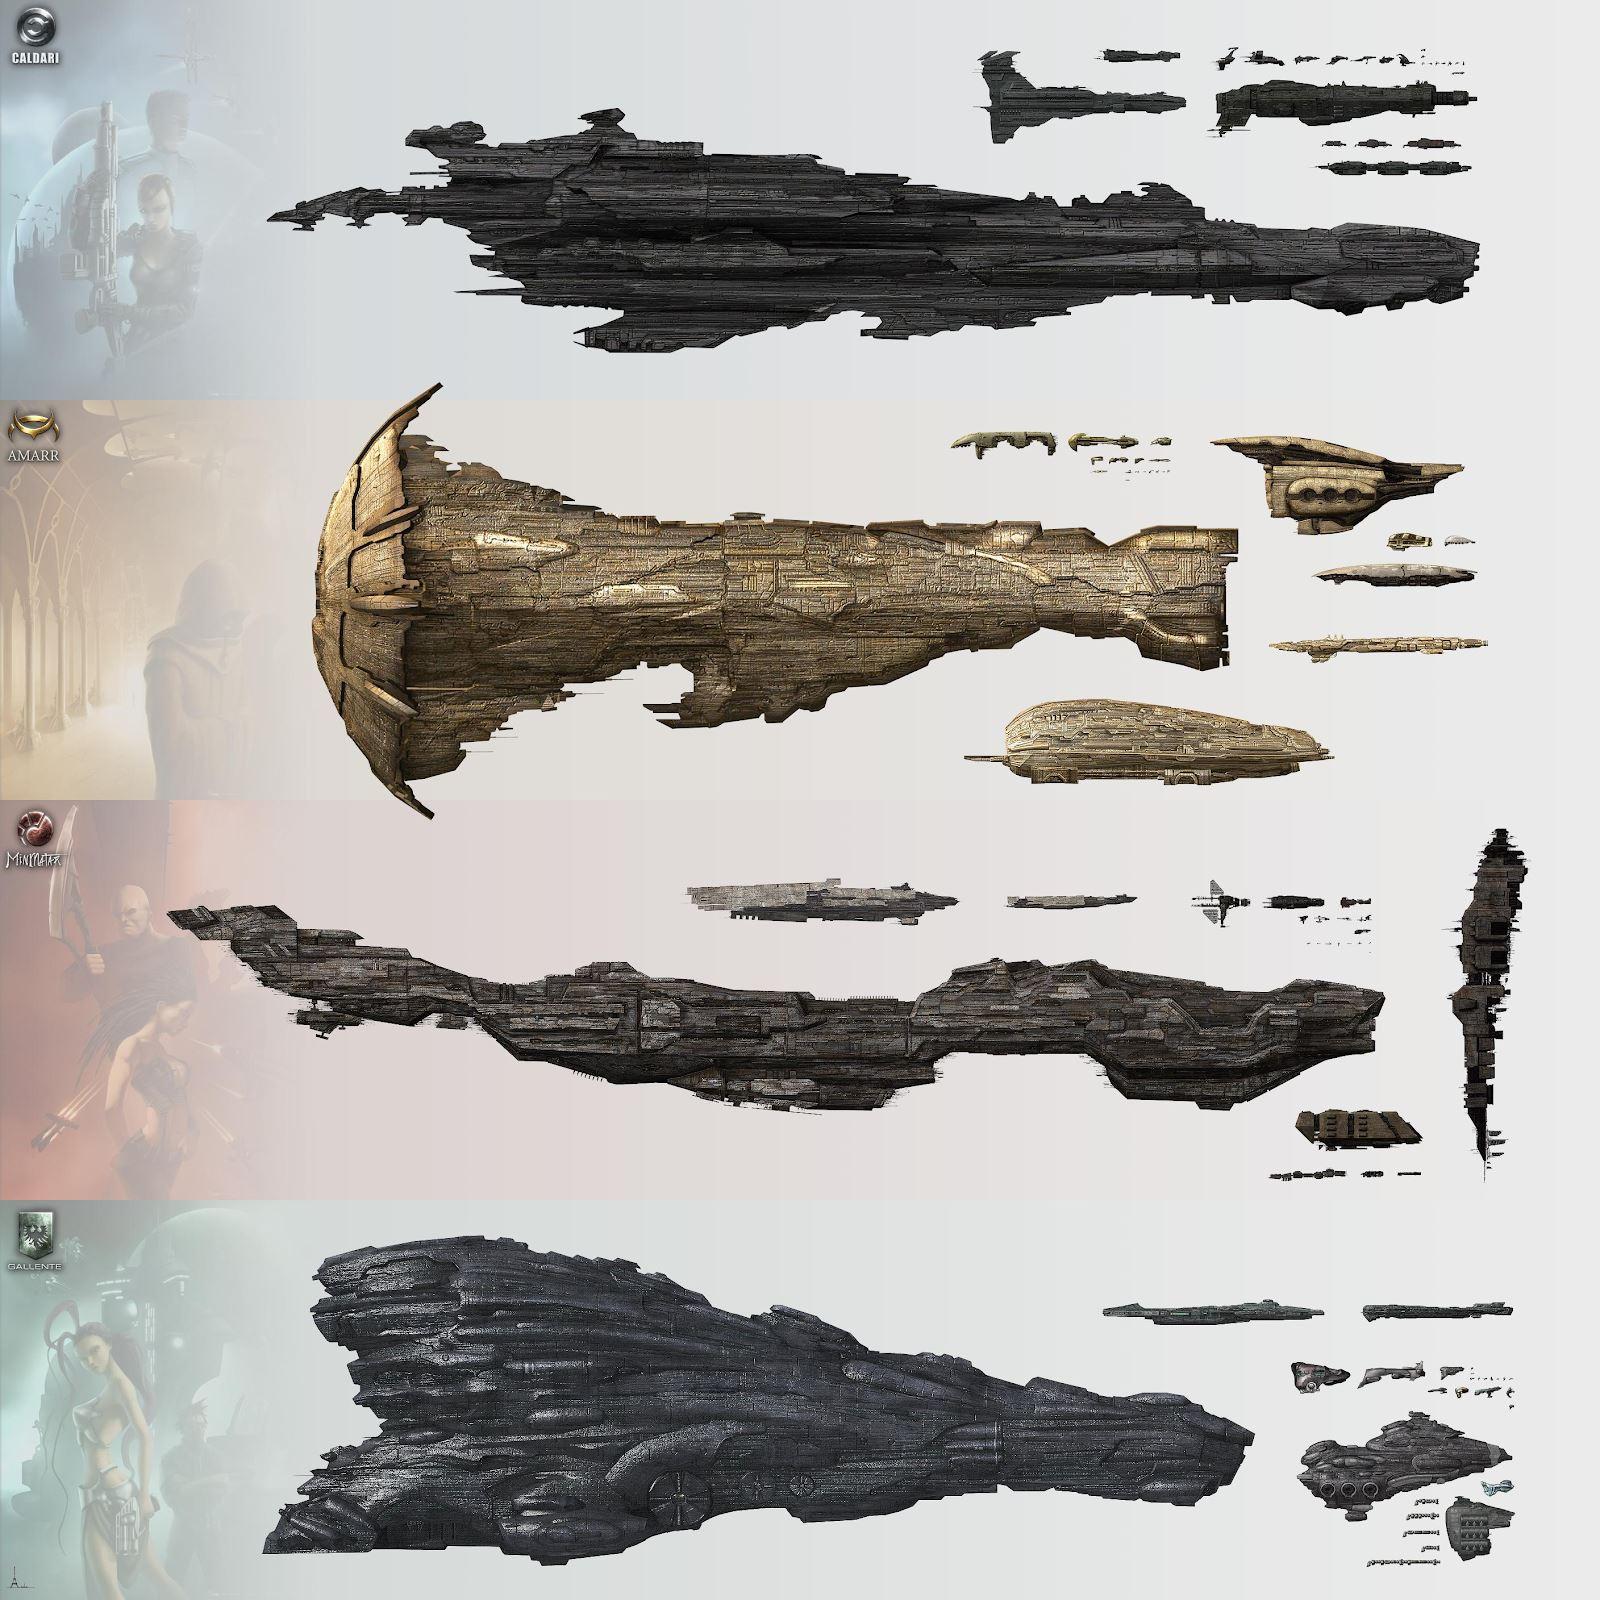 Caldari, Amarr, Minmatar and Gallente visual ship comparison